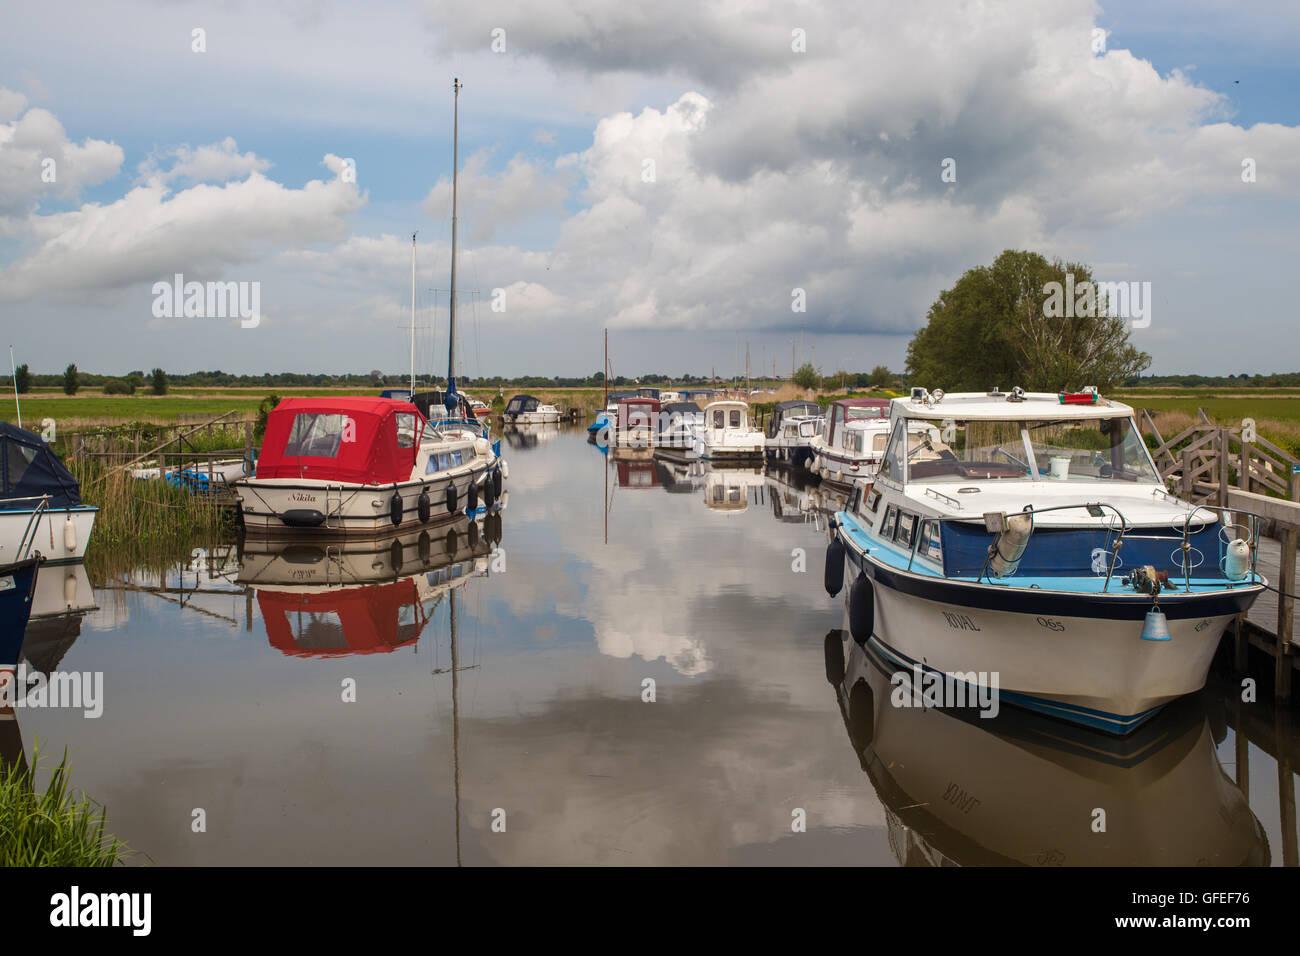 boats on river at hardley quay - Stock Image